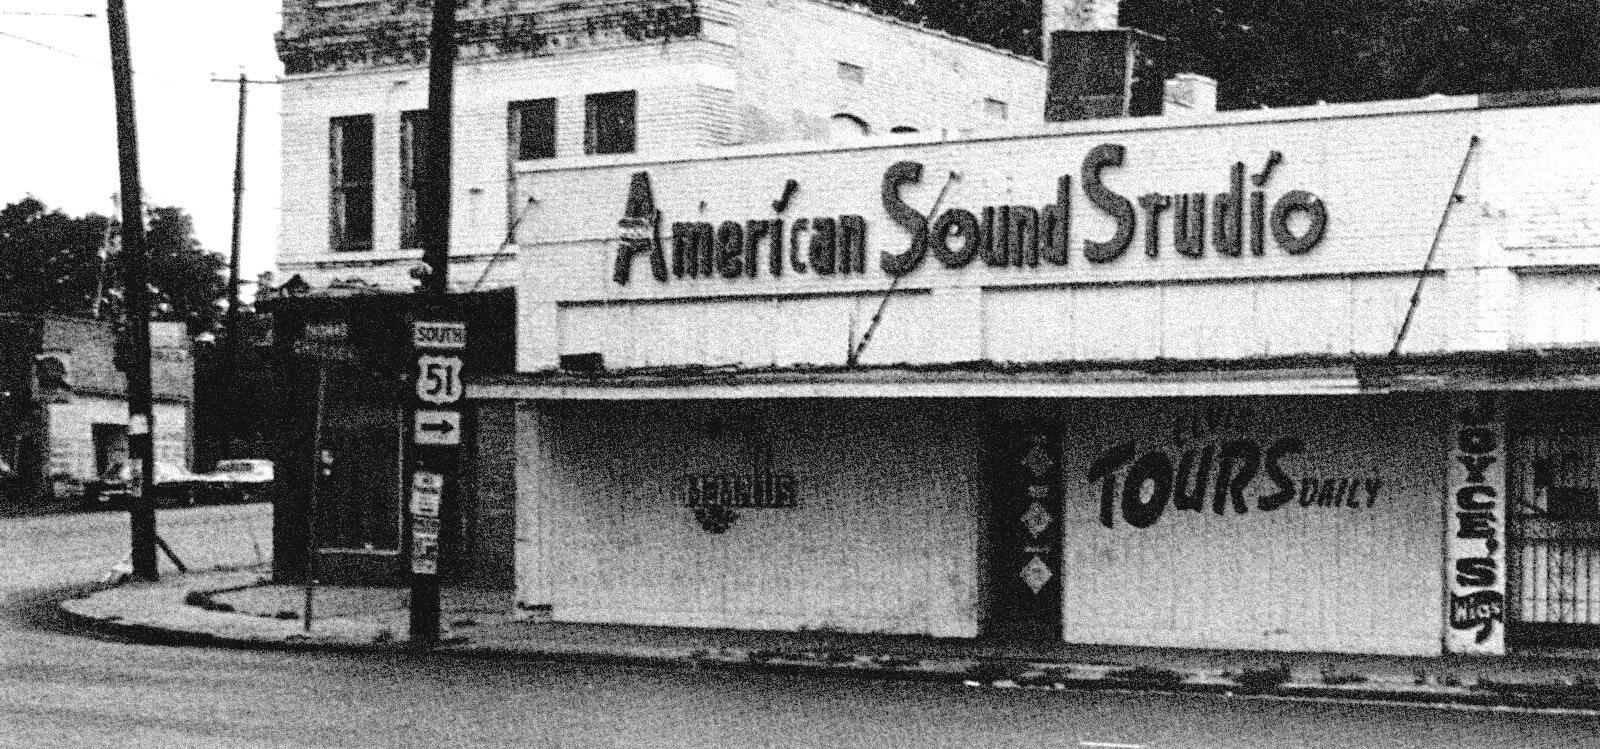 American Sound Studio building, exterior